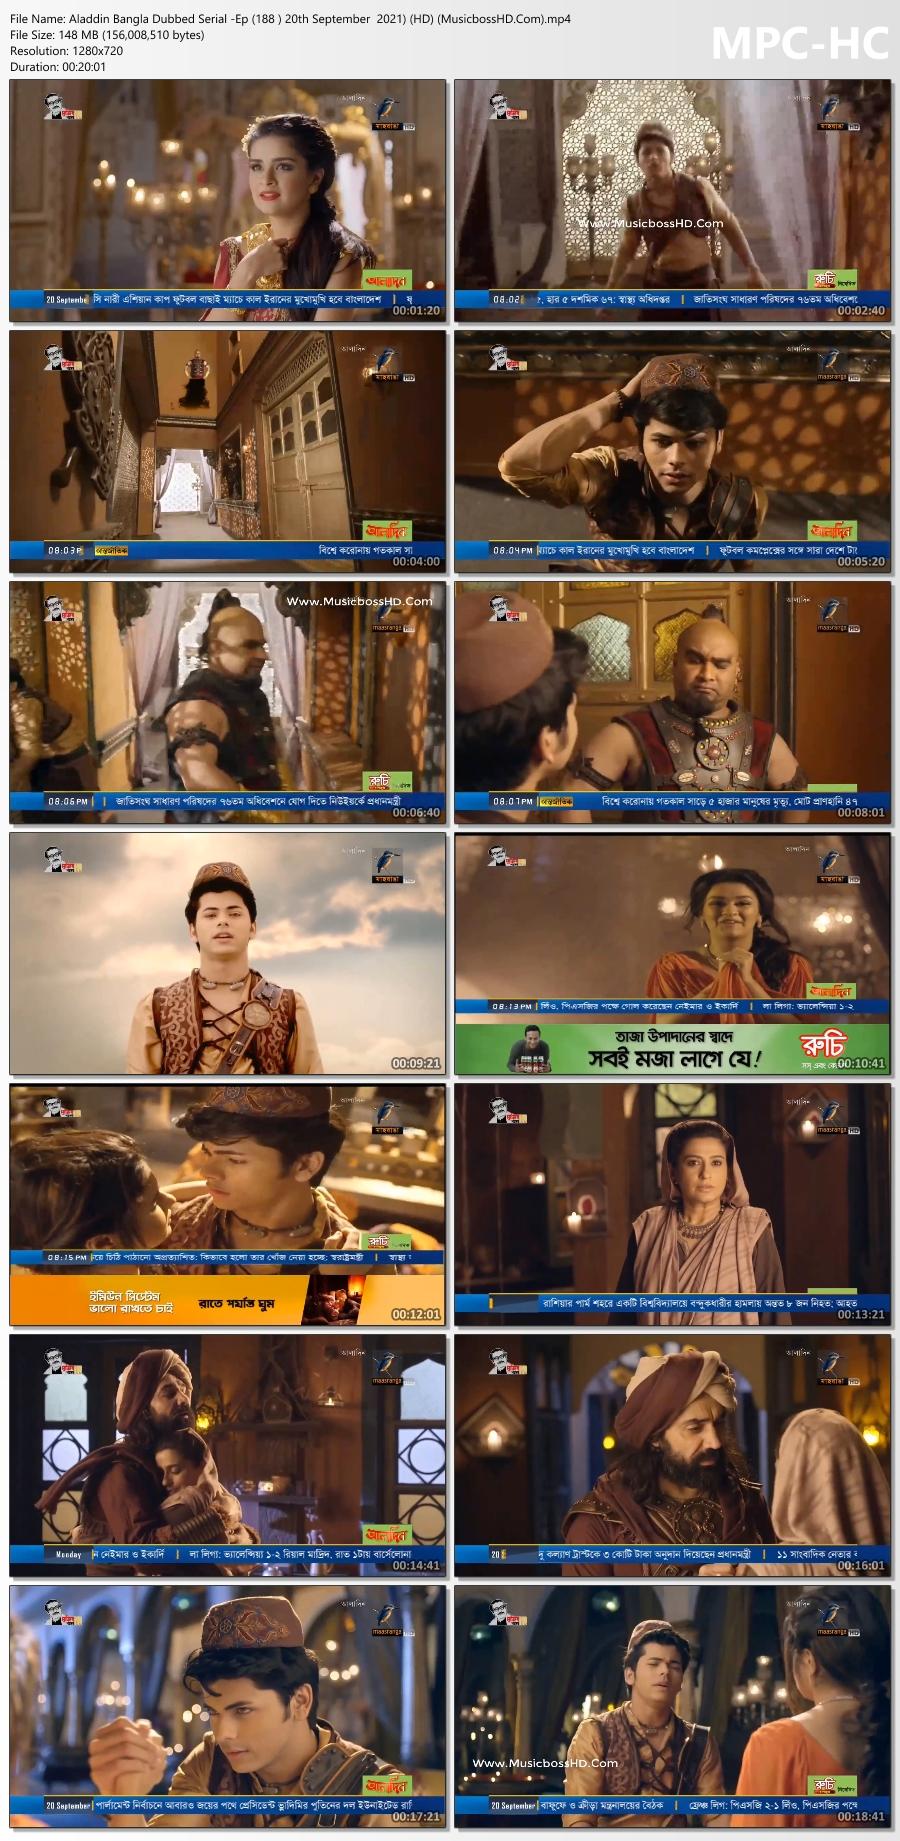 Aladdin-Bangla-Dubbed-Serial-Ep-188-20th-September-2021-HD-Musicboss-HD-Com-mp4-thumbs